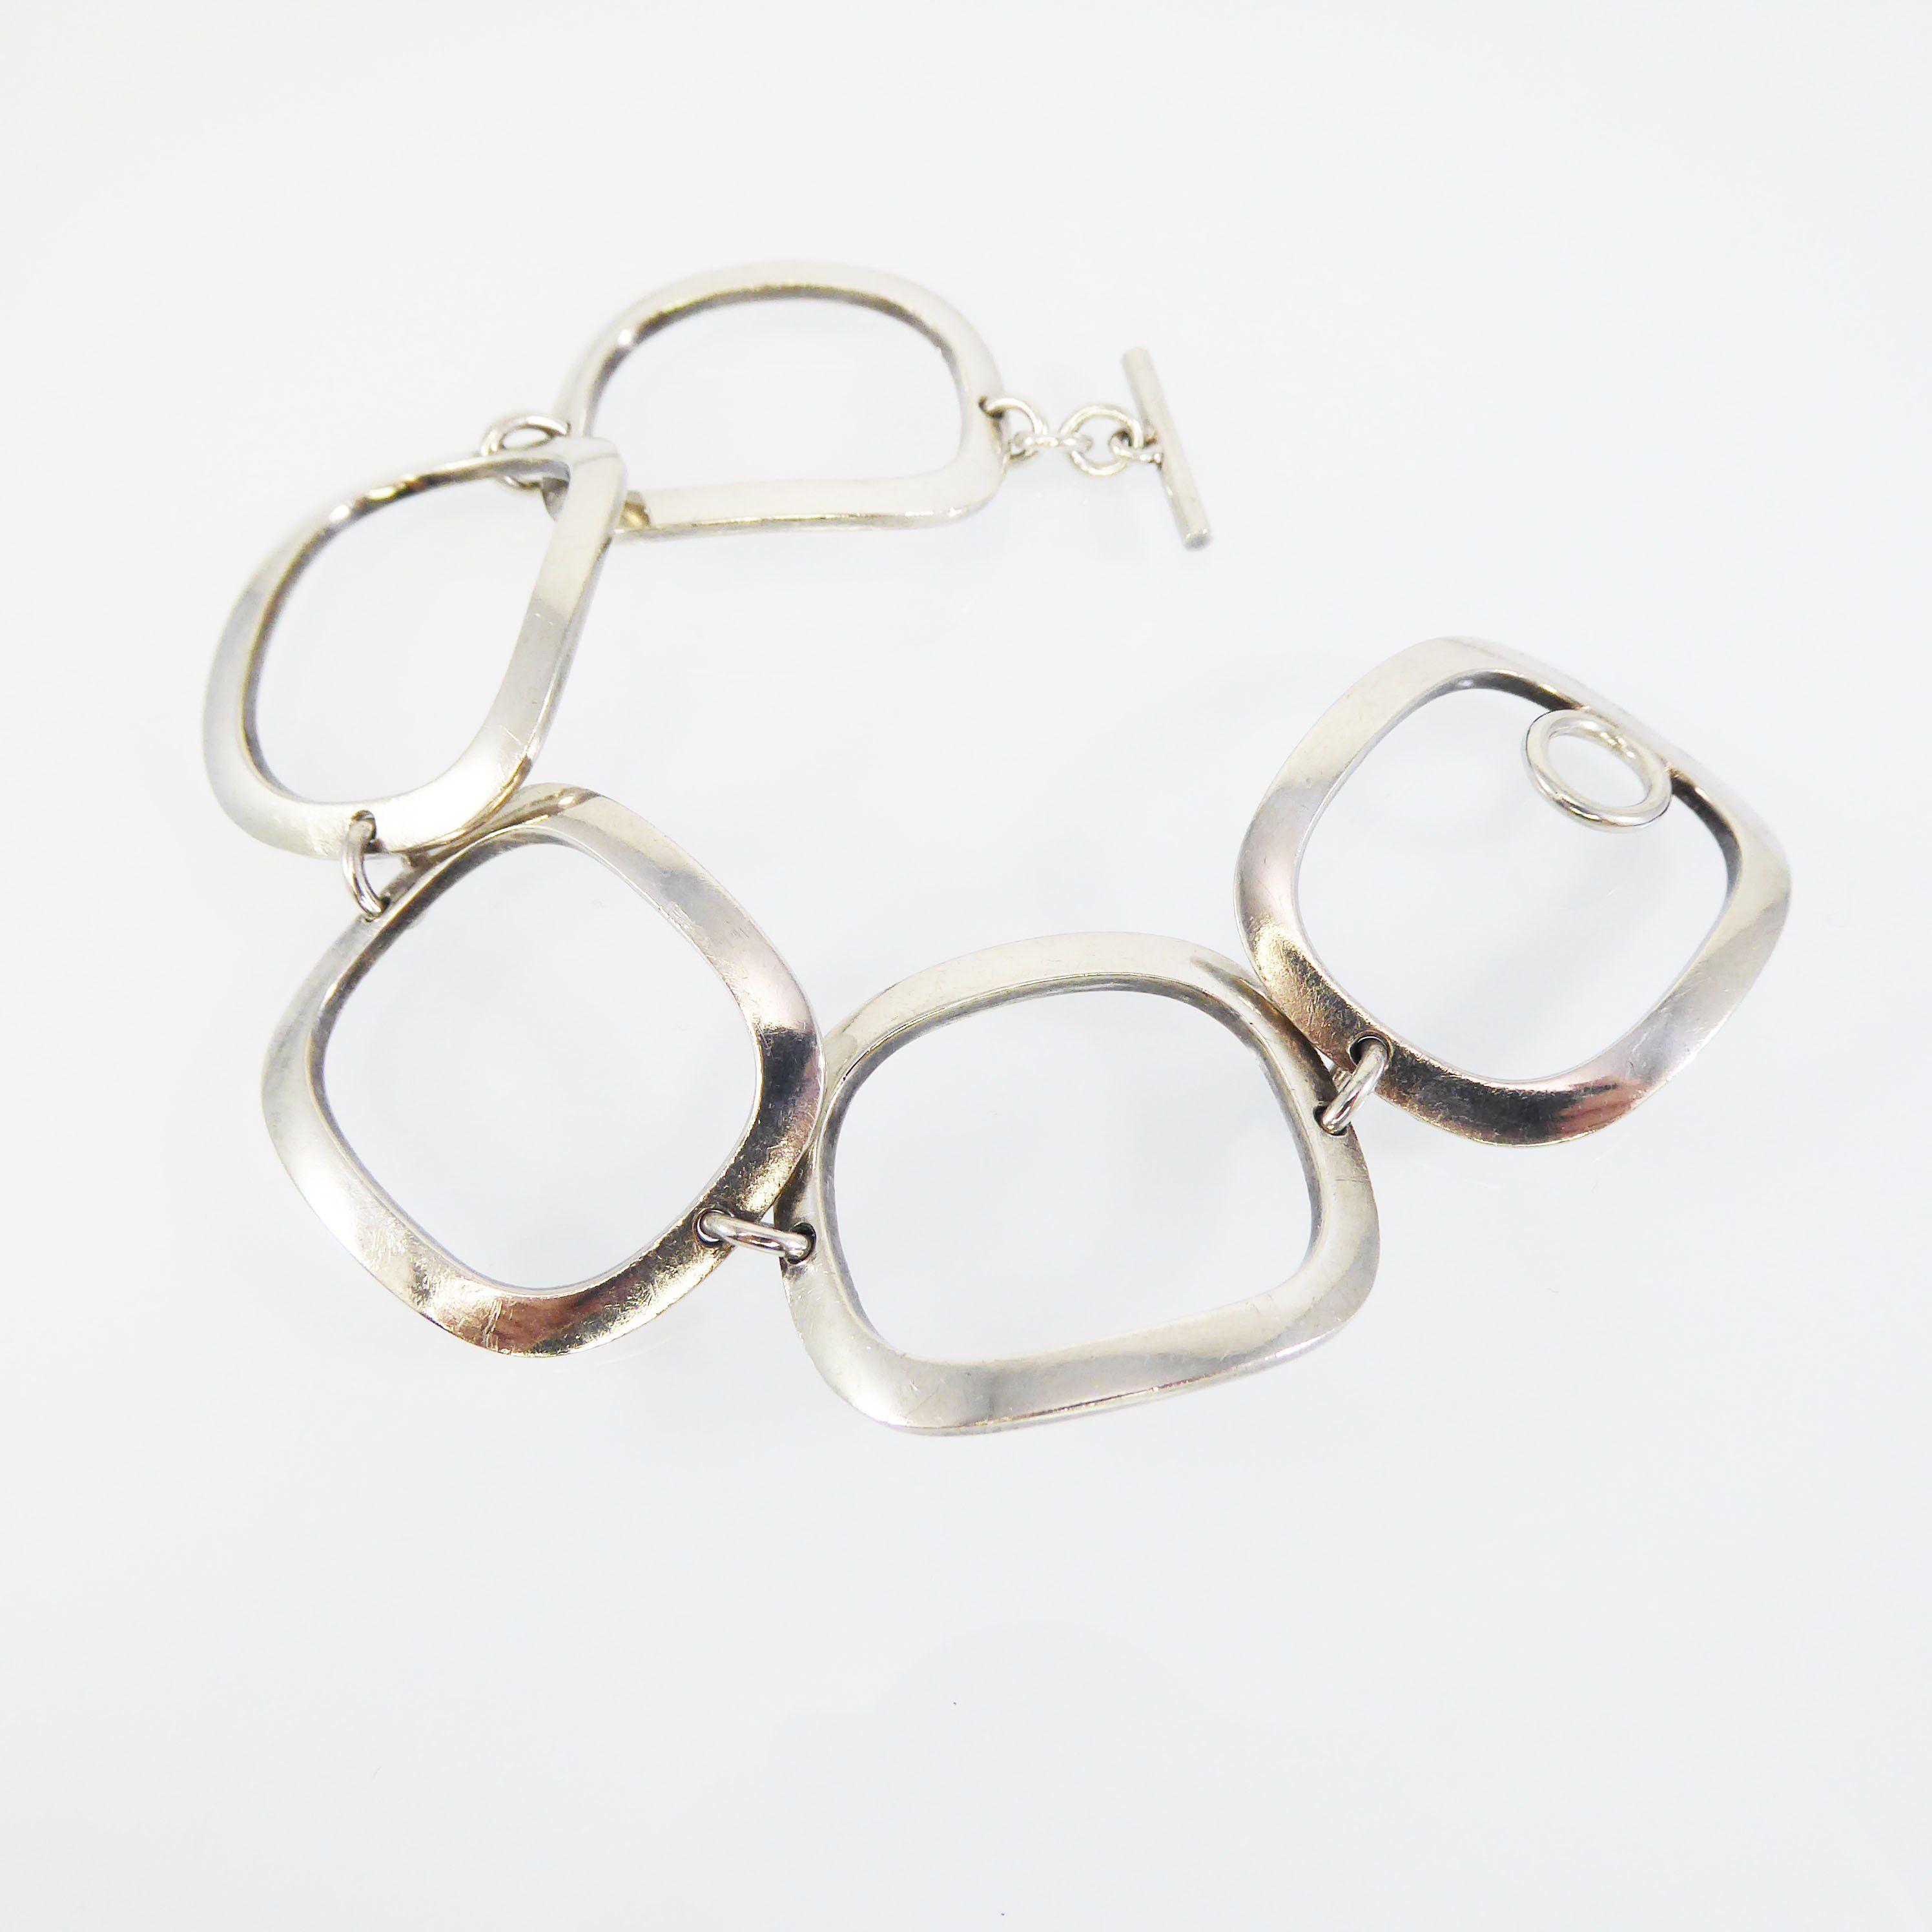 Georg Jensen Sterling Silver Bracelet Modernist Square Links Scandinavian Danish Artist Signed 925 Denmark 192b V Silver Bracelets Georg Jensen Jewelry Jewelry